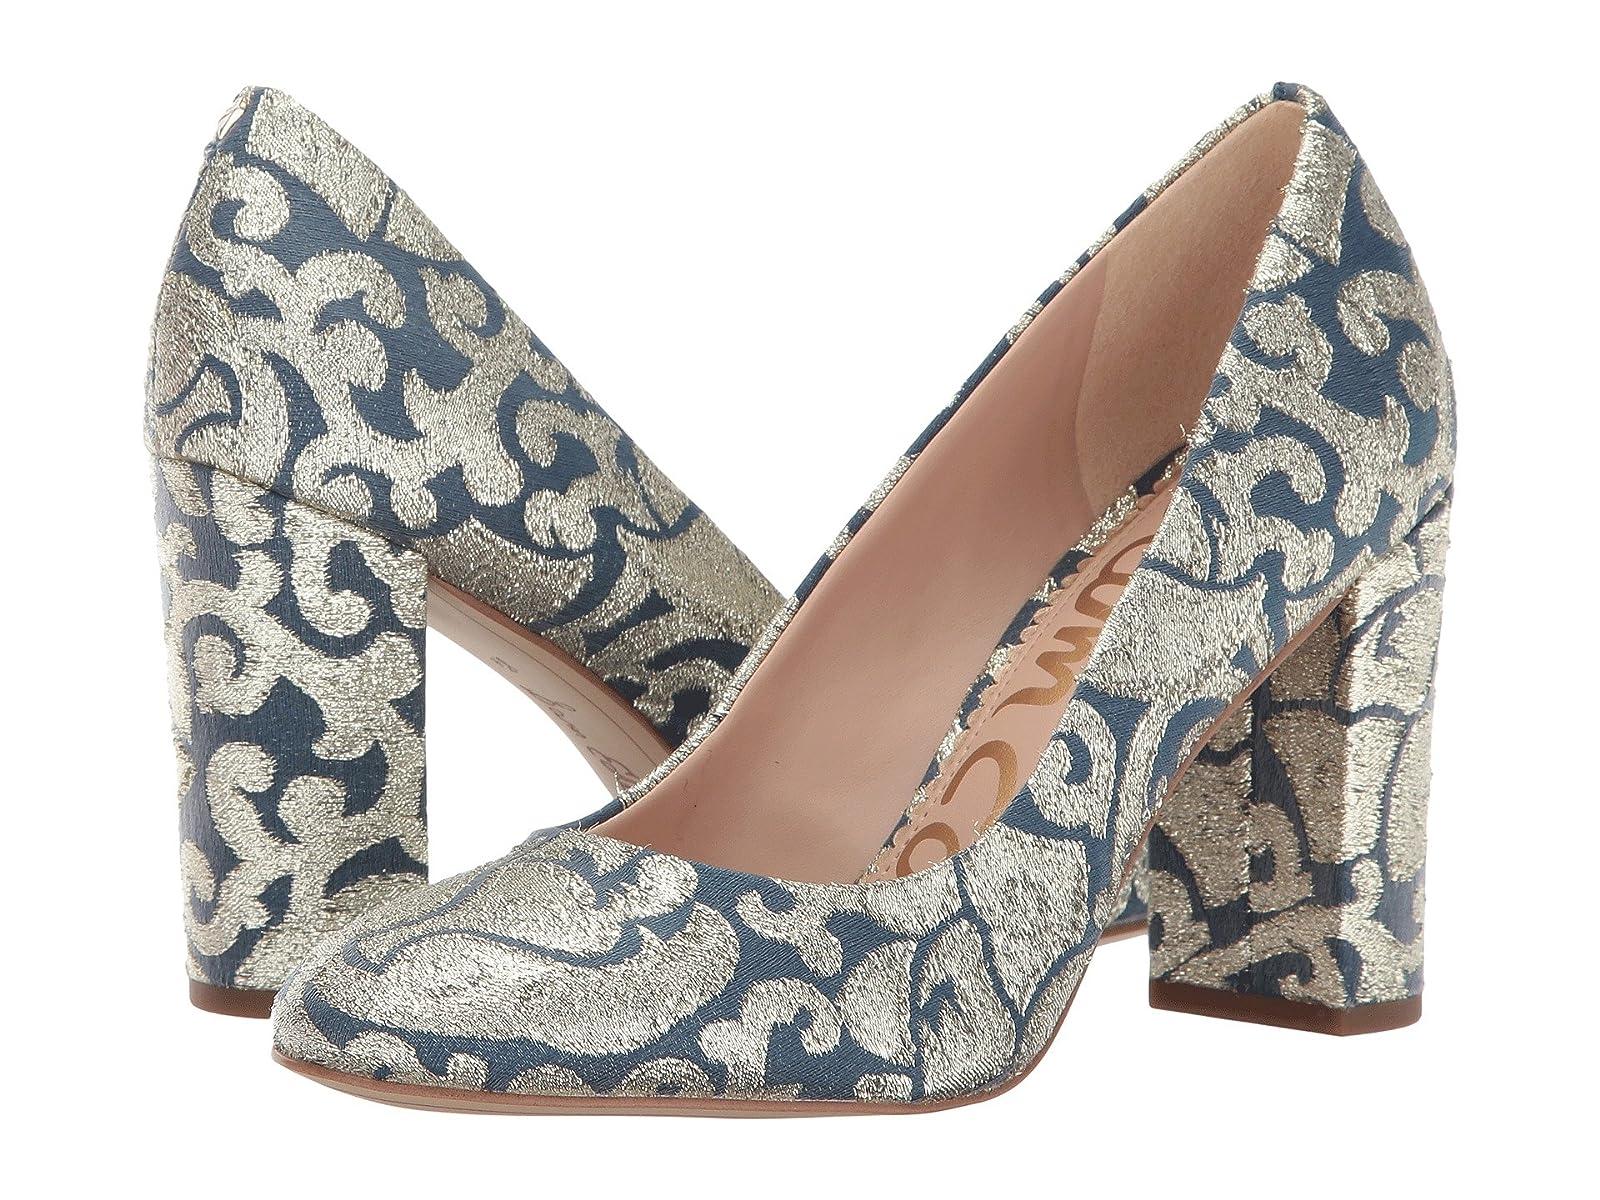 Sam Edelman StillsonCheap and distinctive eye-catching shoes